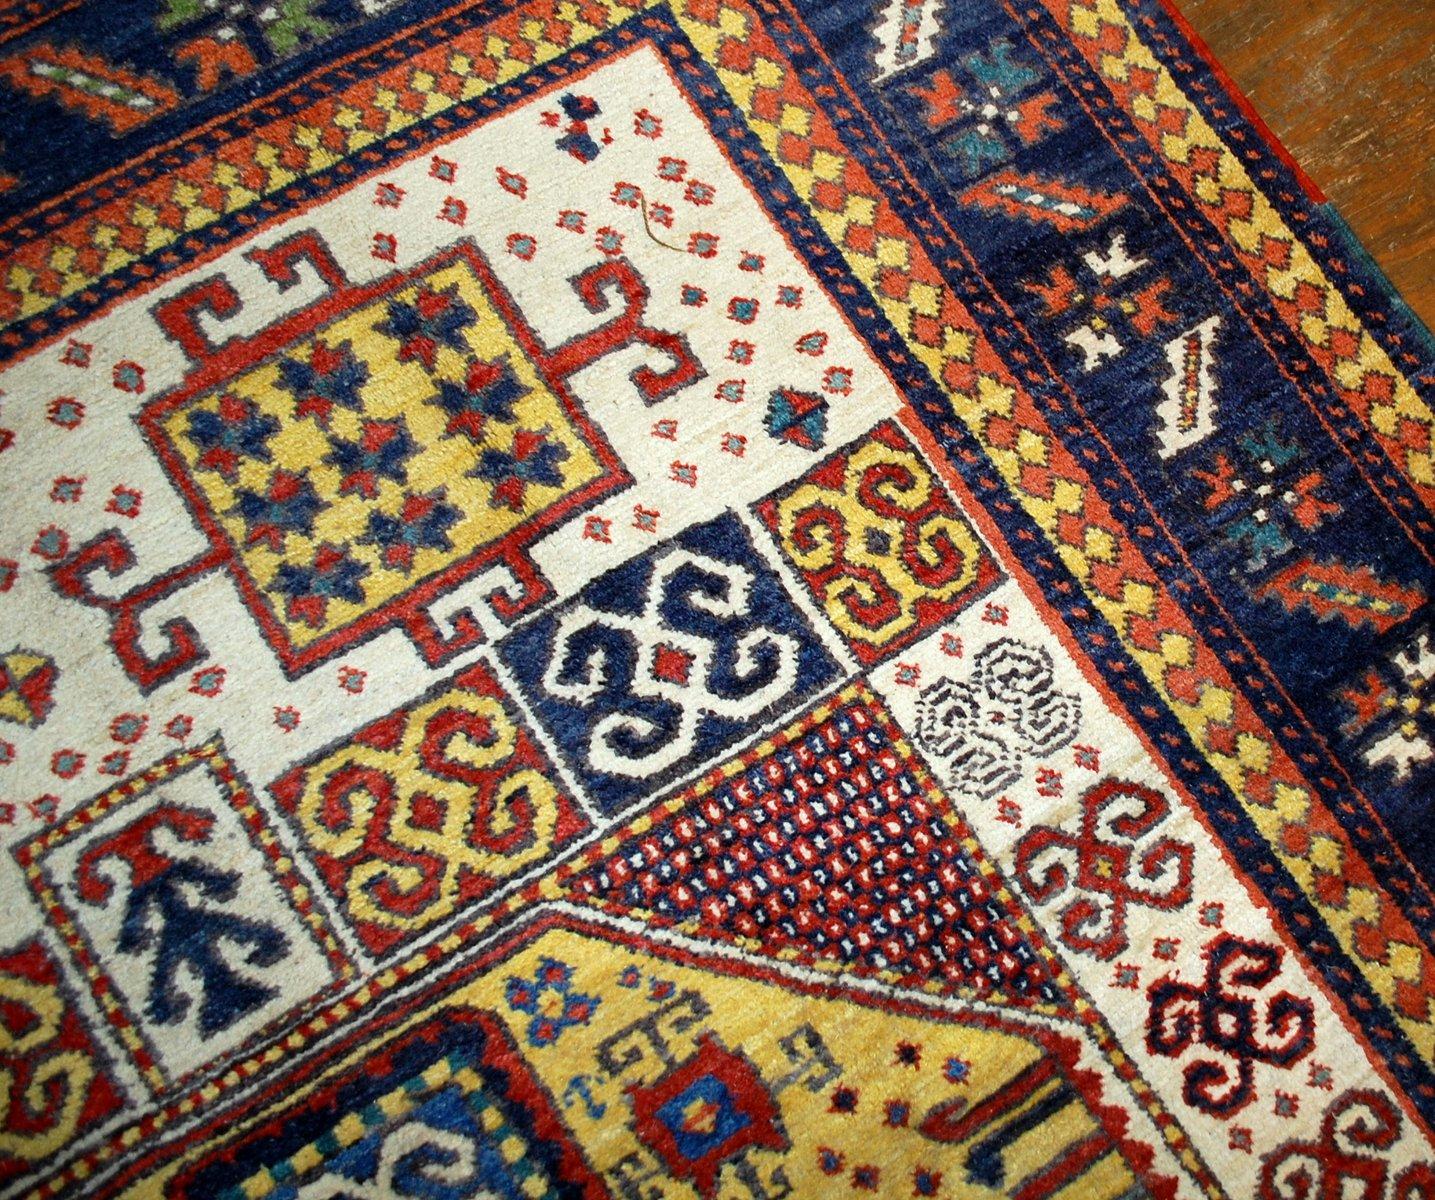 Antique Caucasian Handmade Kazak Karachov Rug, 1940s For